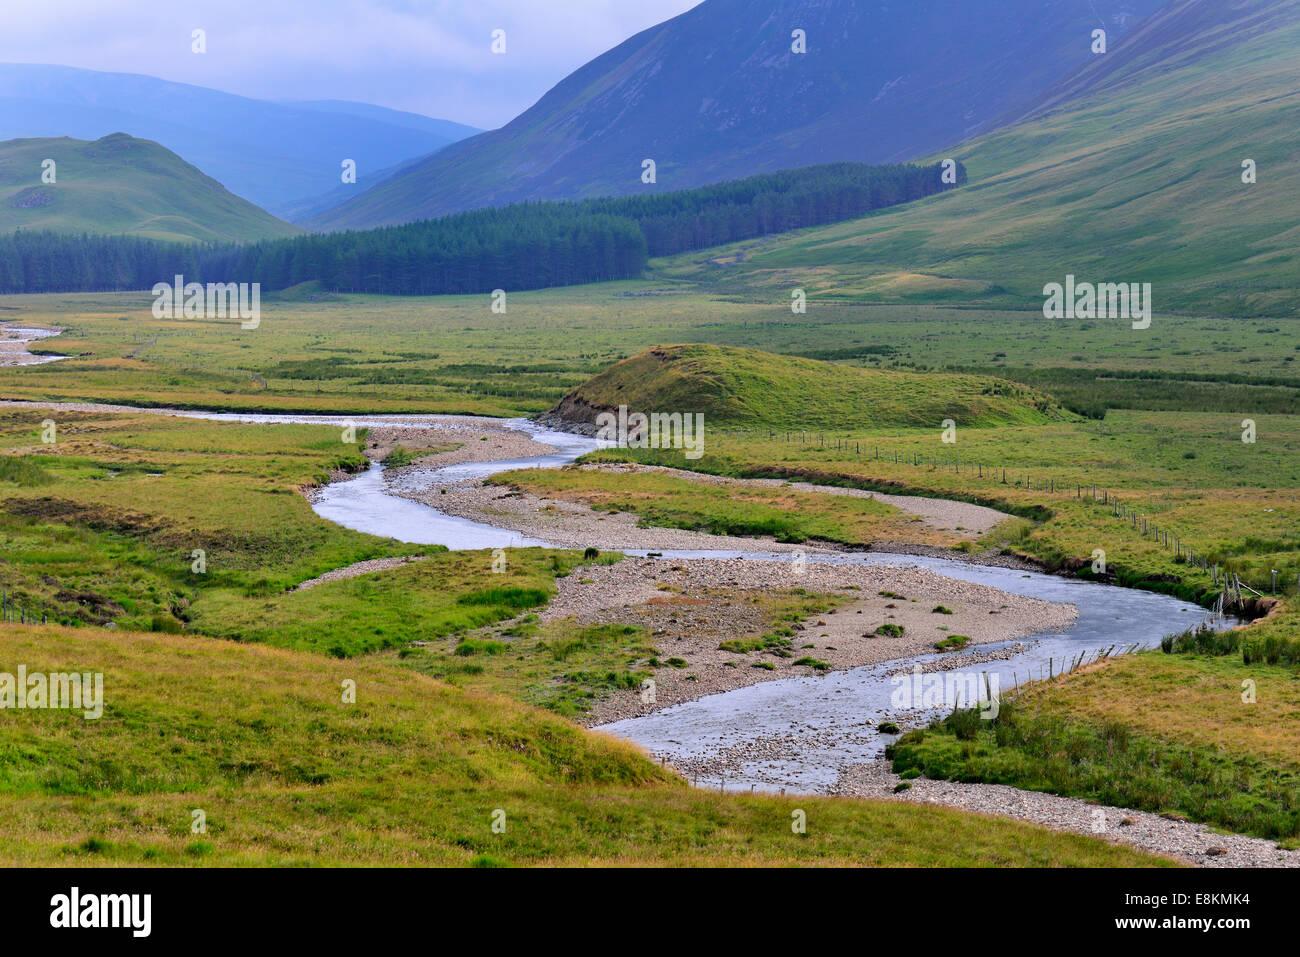 Typical landscape on the Clunie Water, Braemar, Aberdeenshire, Grampian, Scotland, United Kingdom - Stock Image